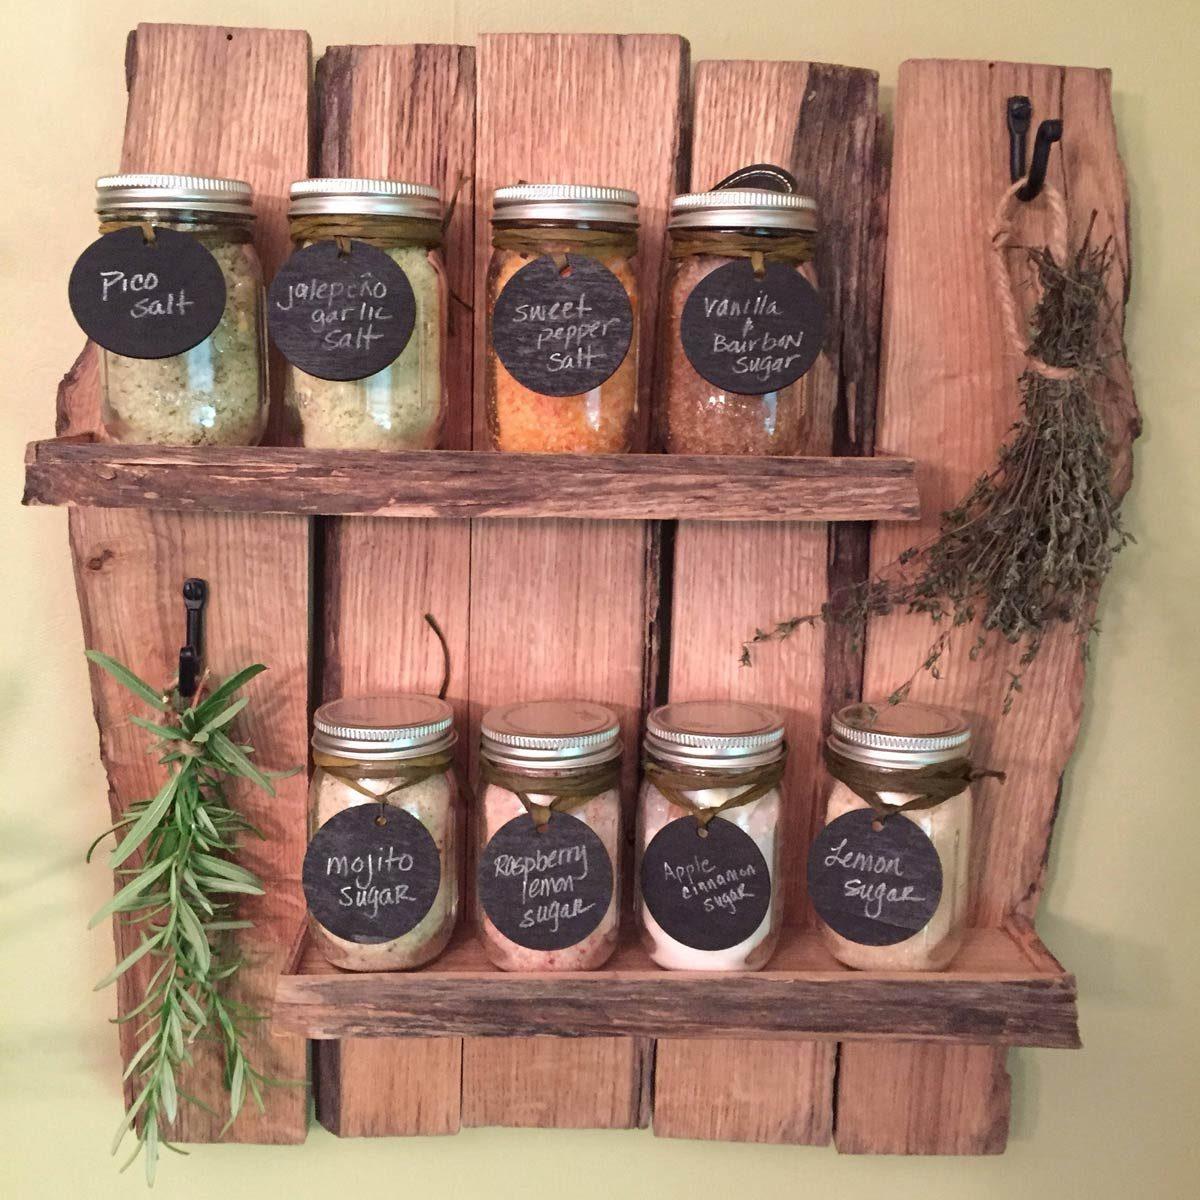 12 Ingenious Spice Storage Ideas The Family Handyman